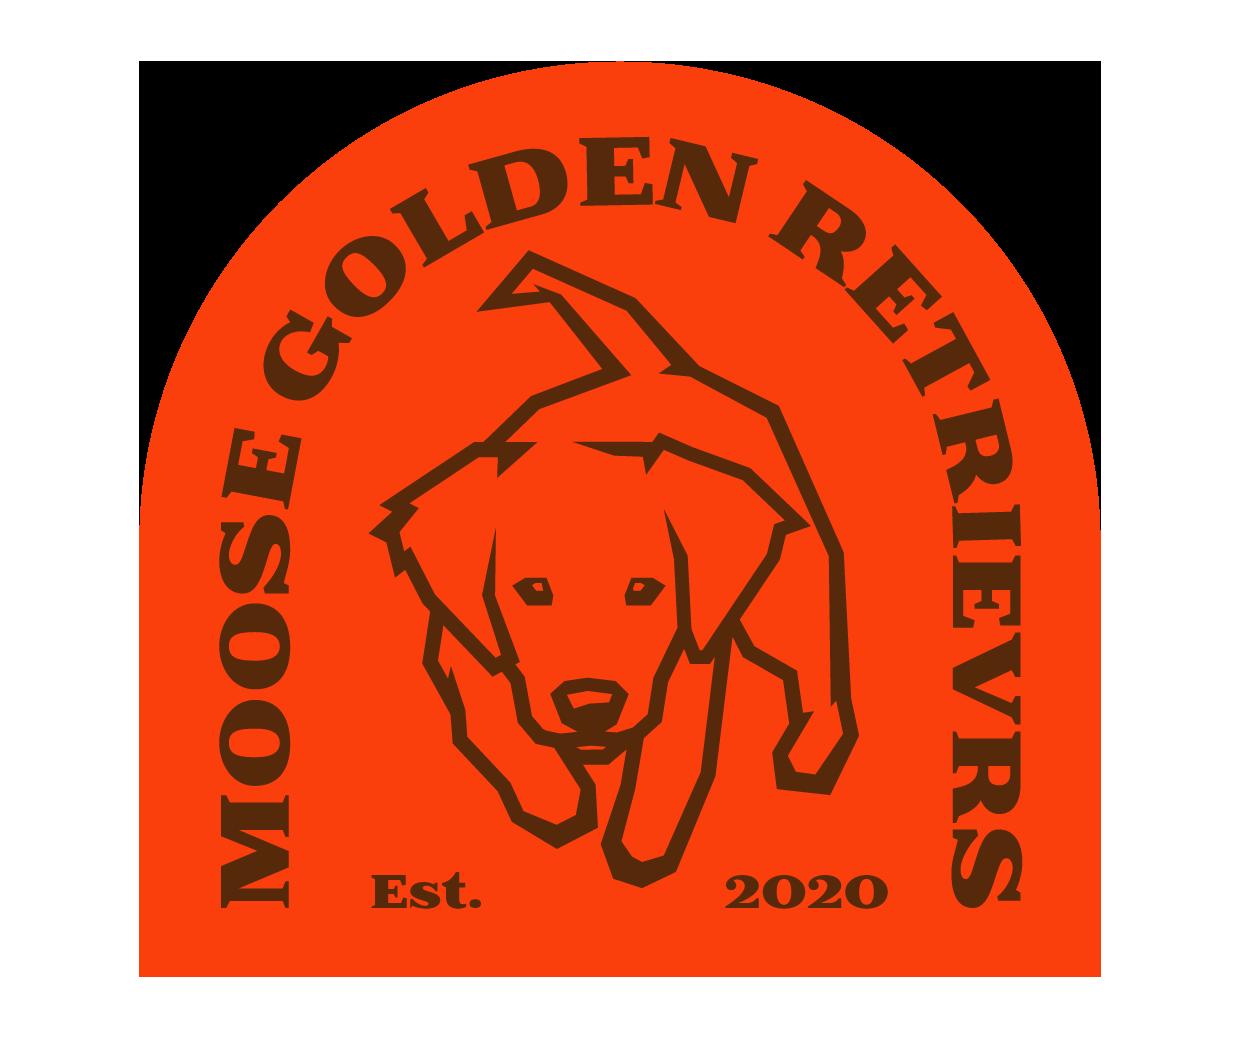 moose golden retriever breeder sticker